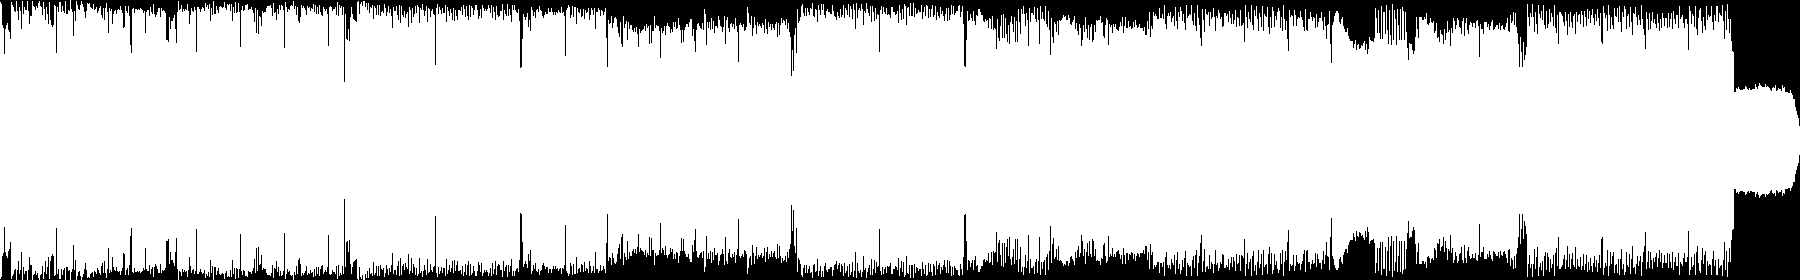 G-House audio waveform